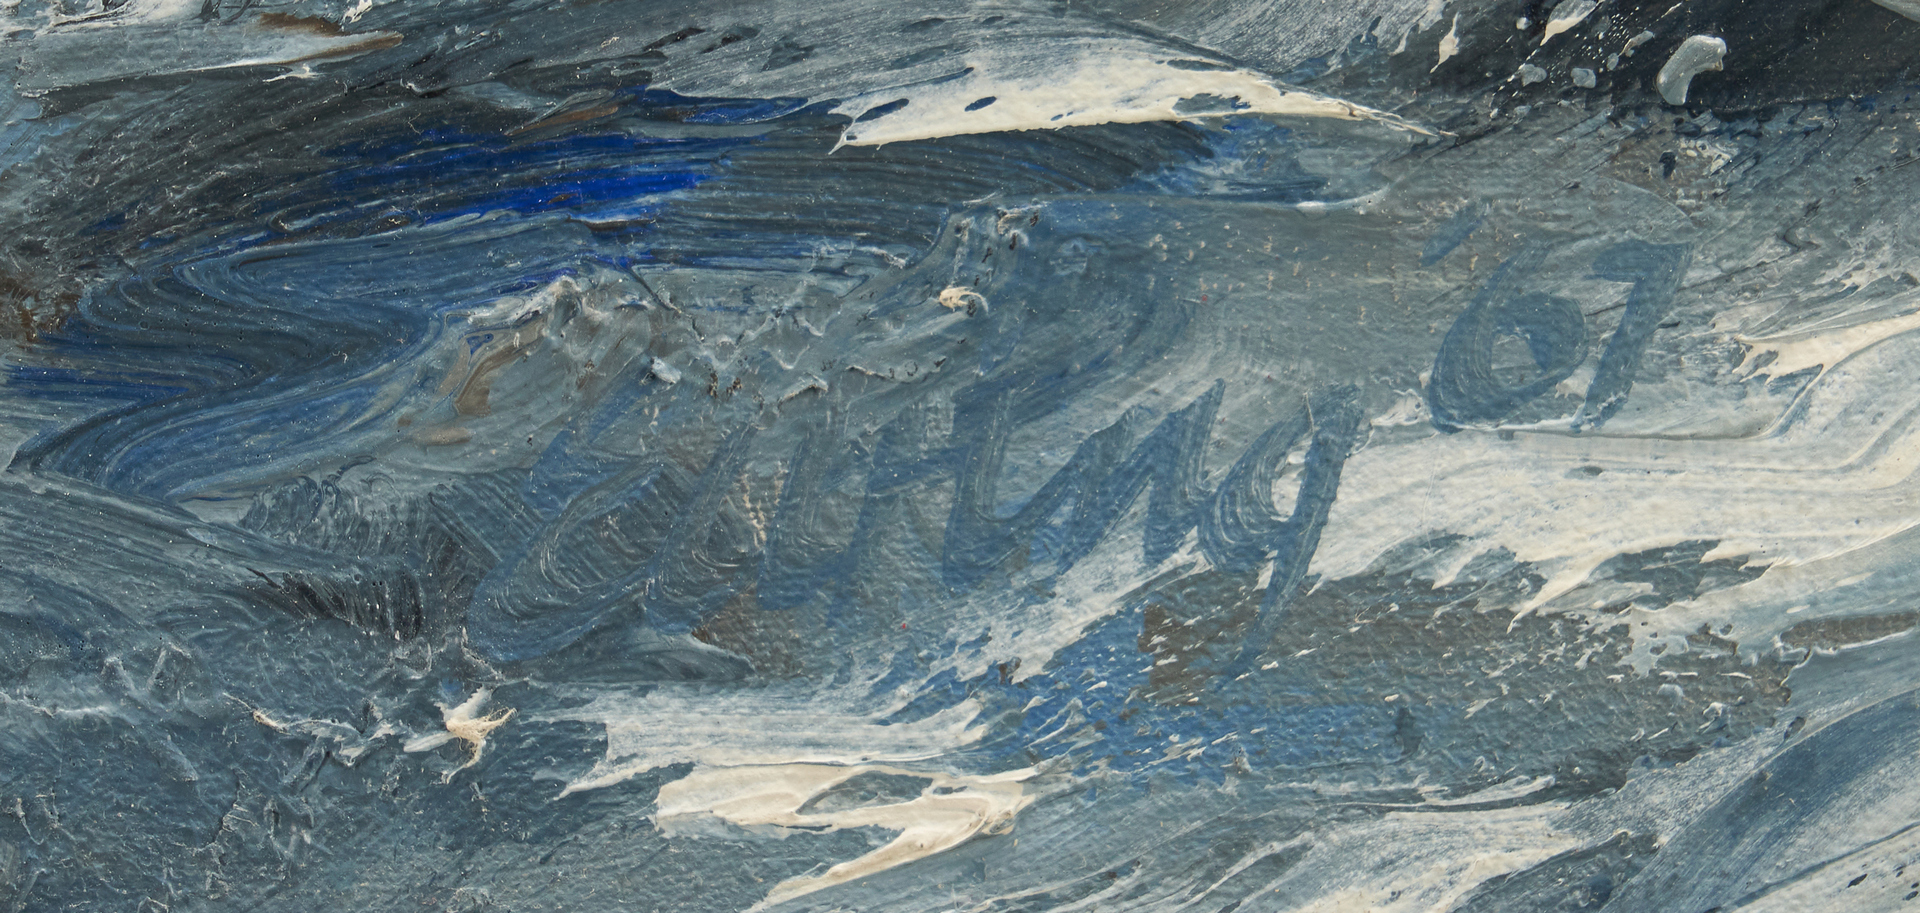 Lot 285: C. Kermit Ewing Oil on Canvas  Seascape